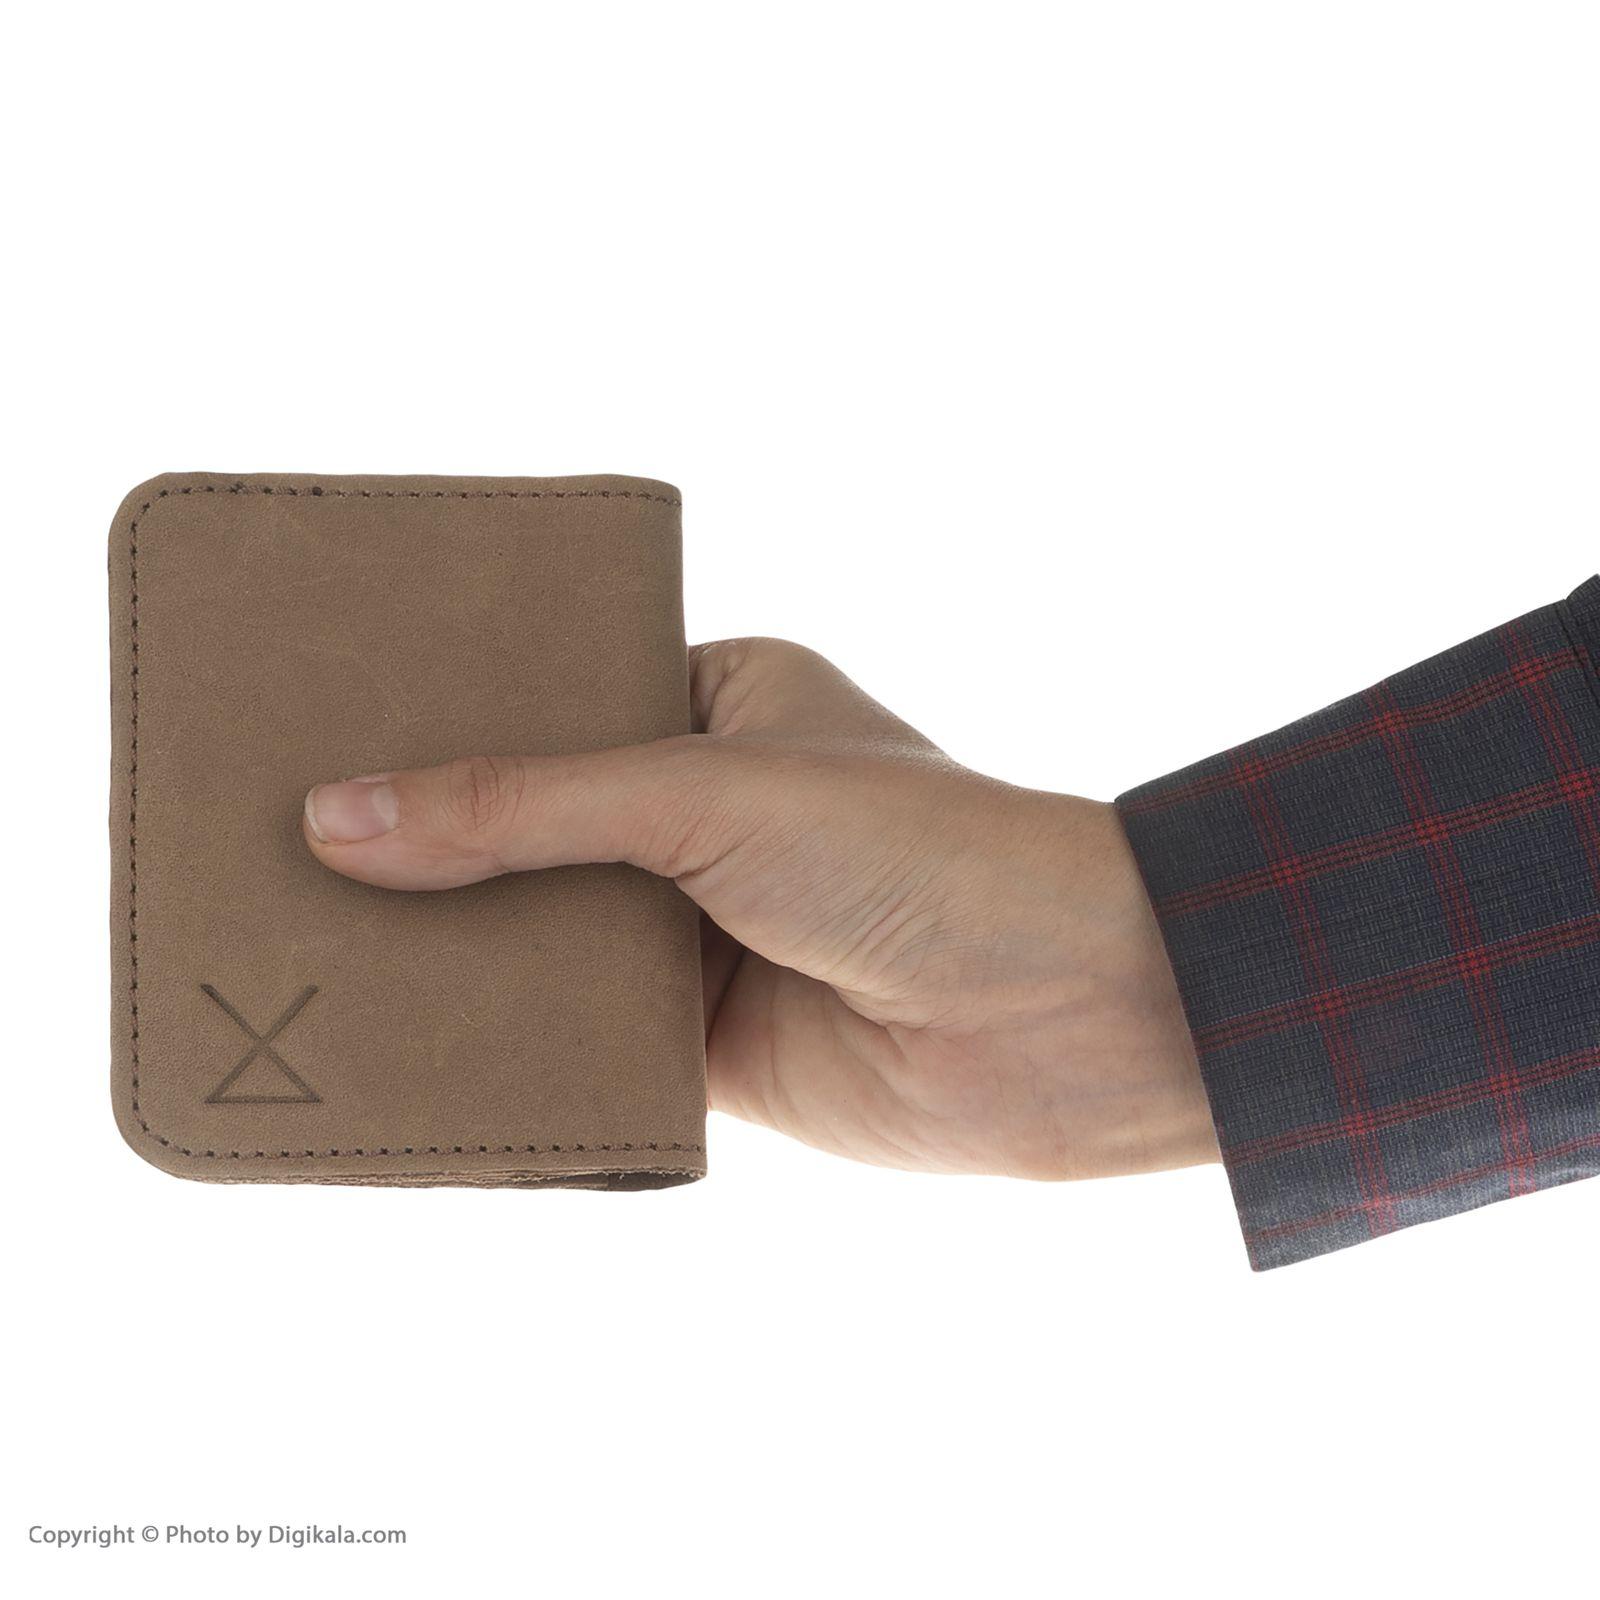 کیف پول مردانه چرم لانکا مدل CC-5-14 main 1 4